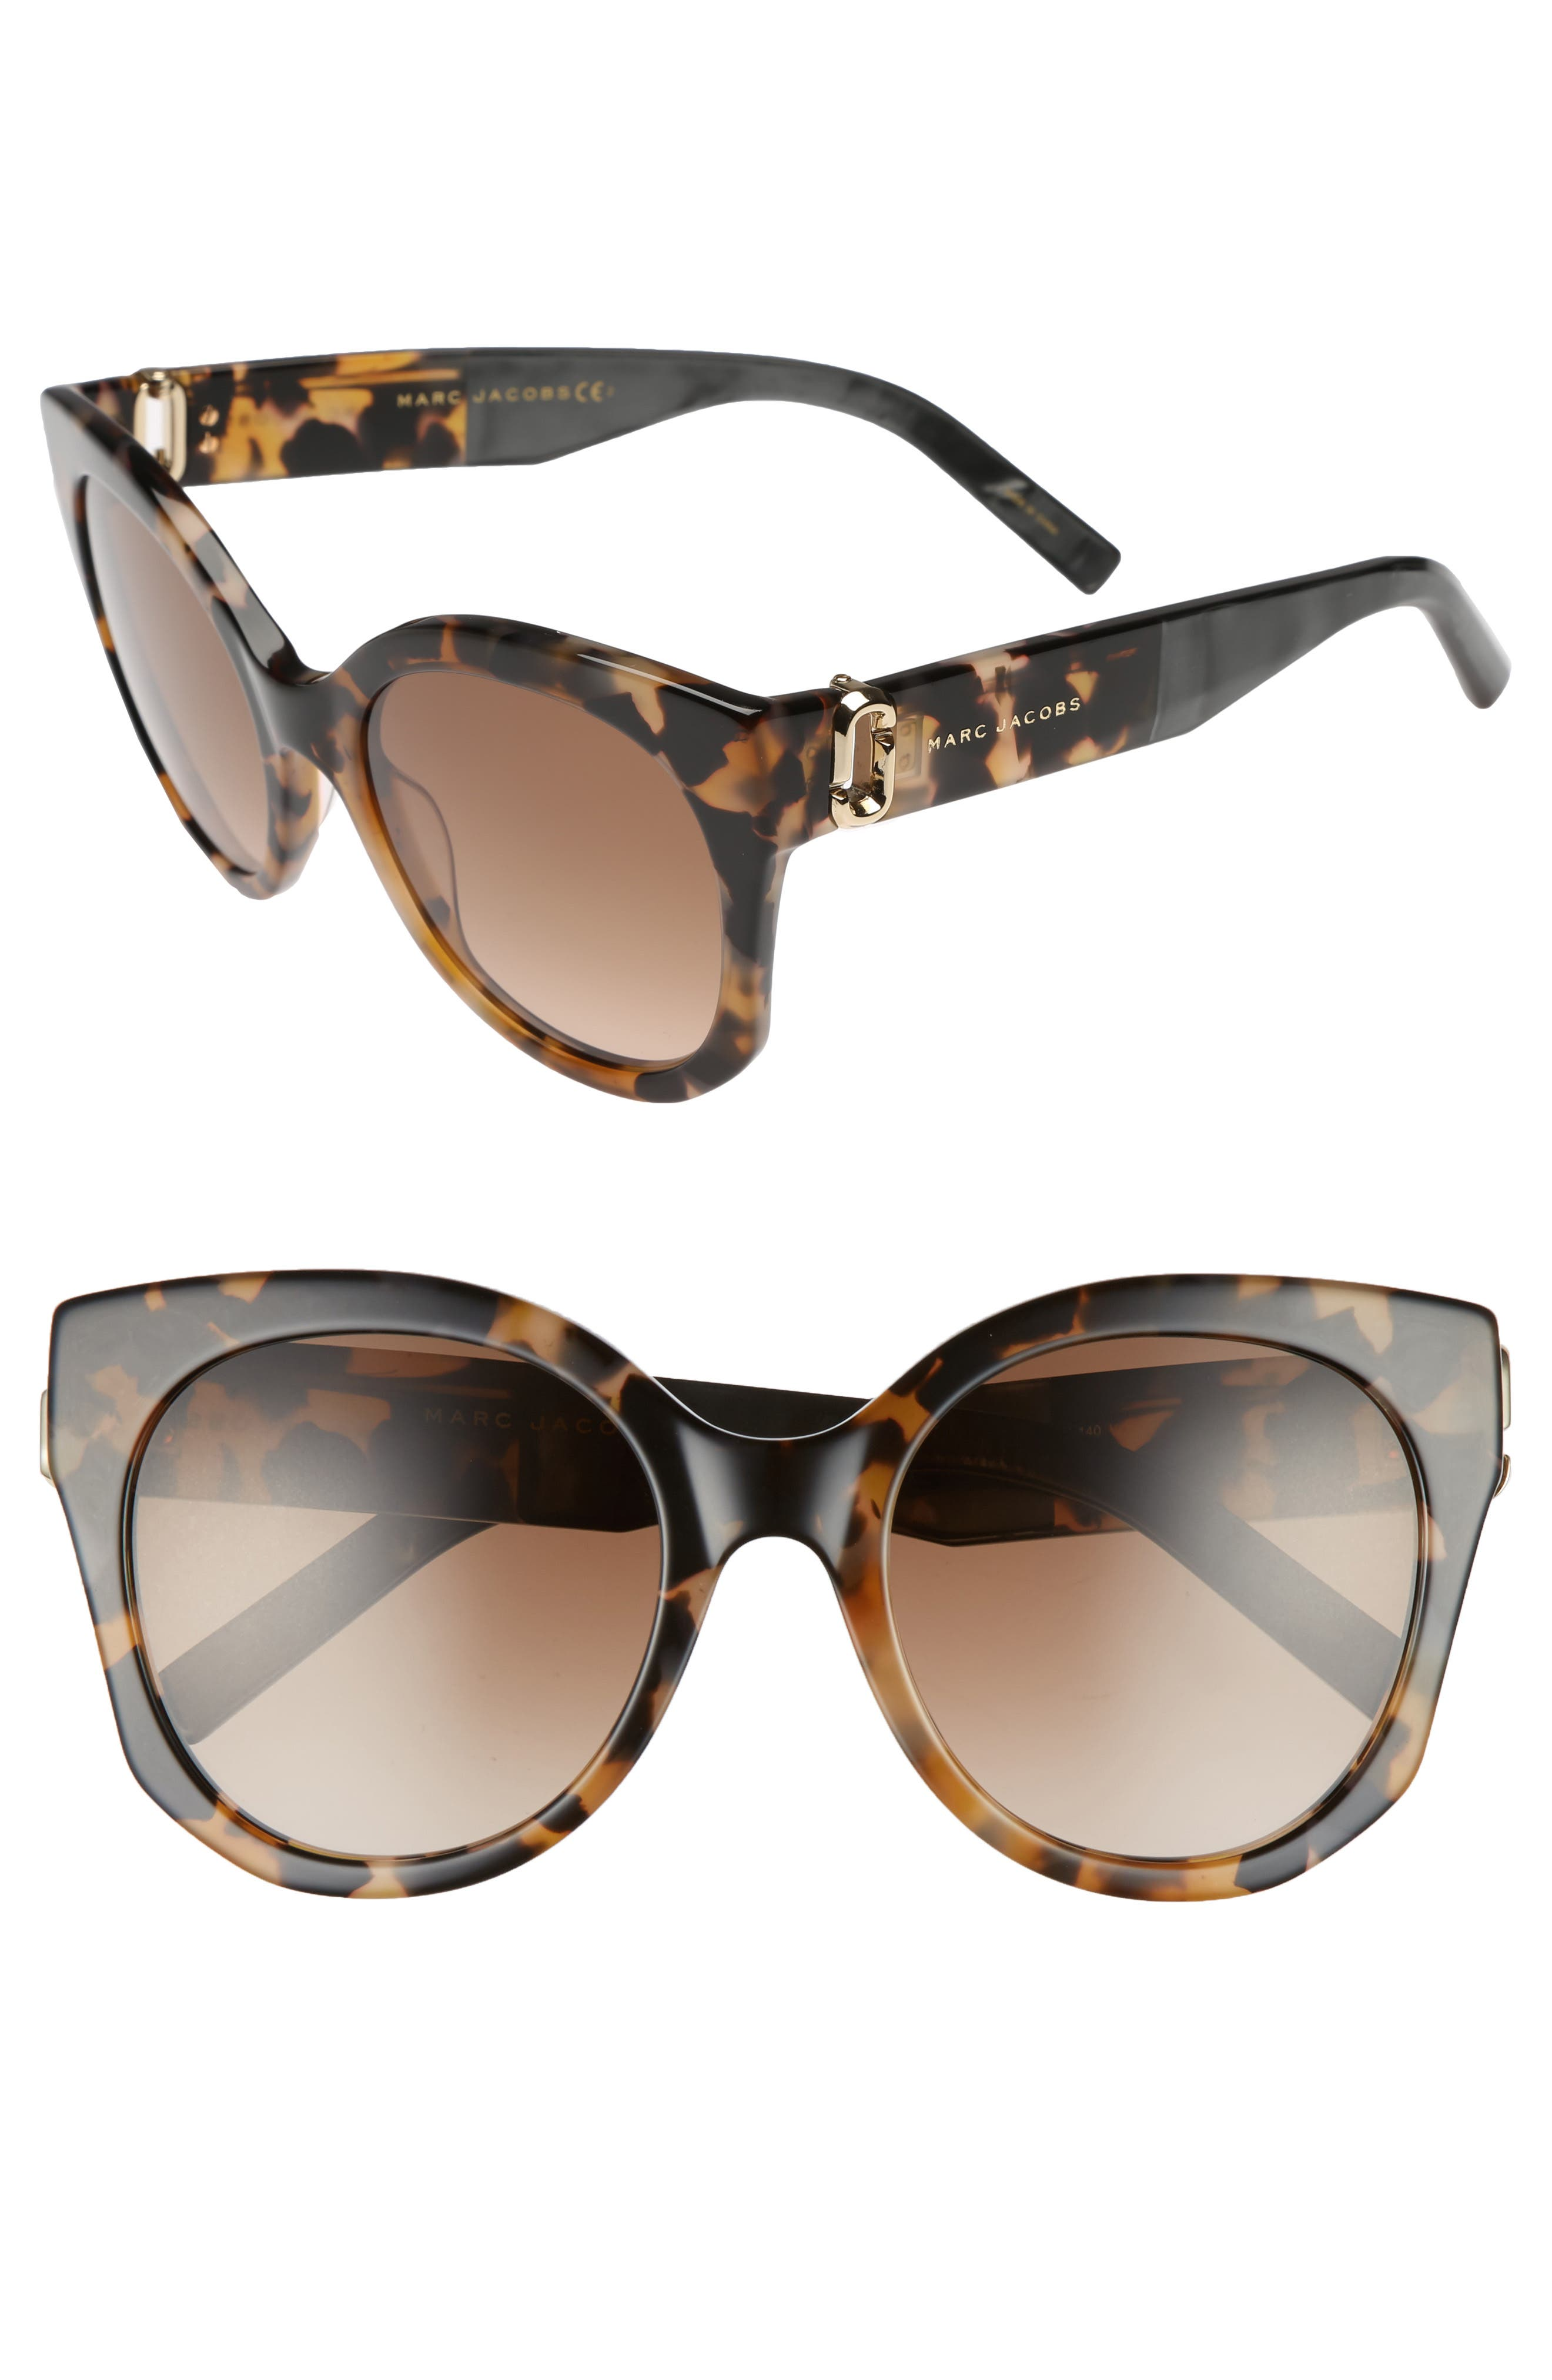 53mm Gradient Lens Cat Eye Sunglasses,                         Main,                         color, Dark Havanna